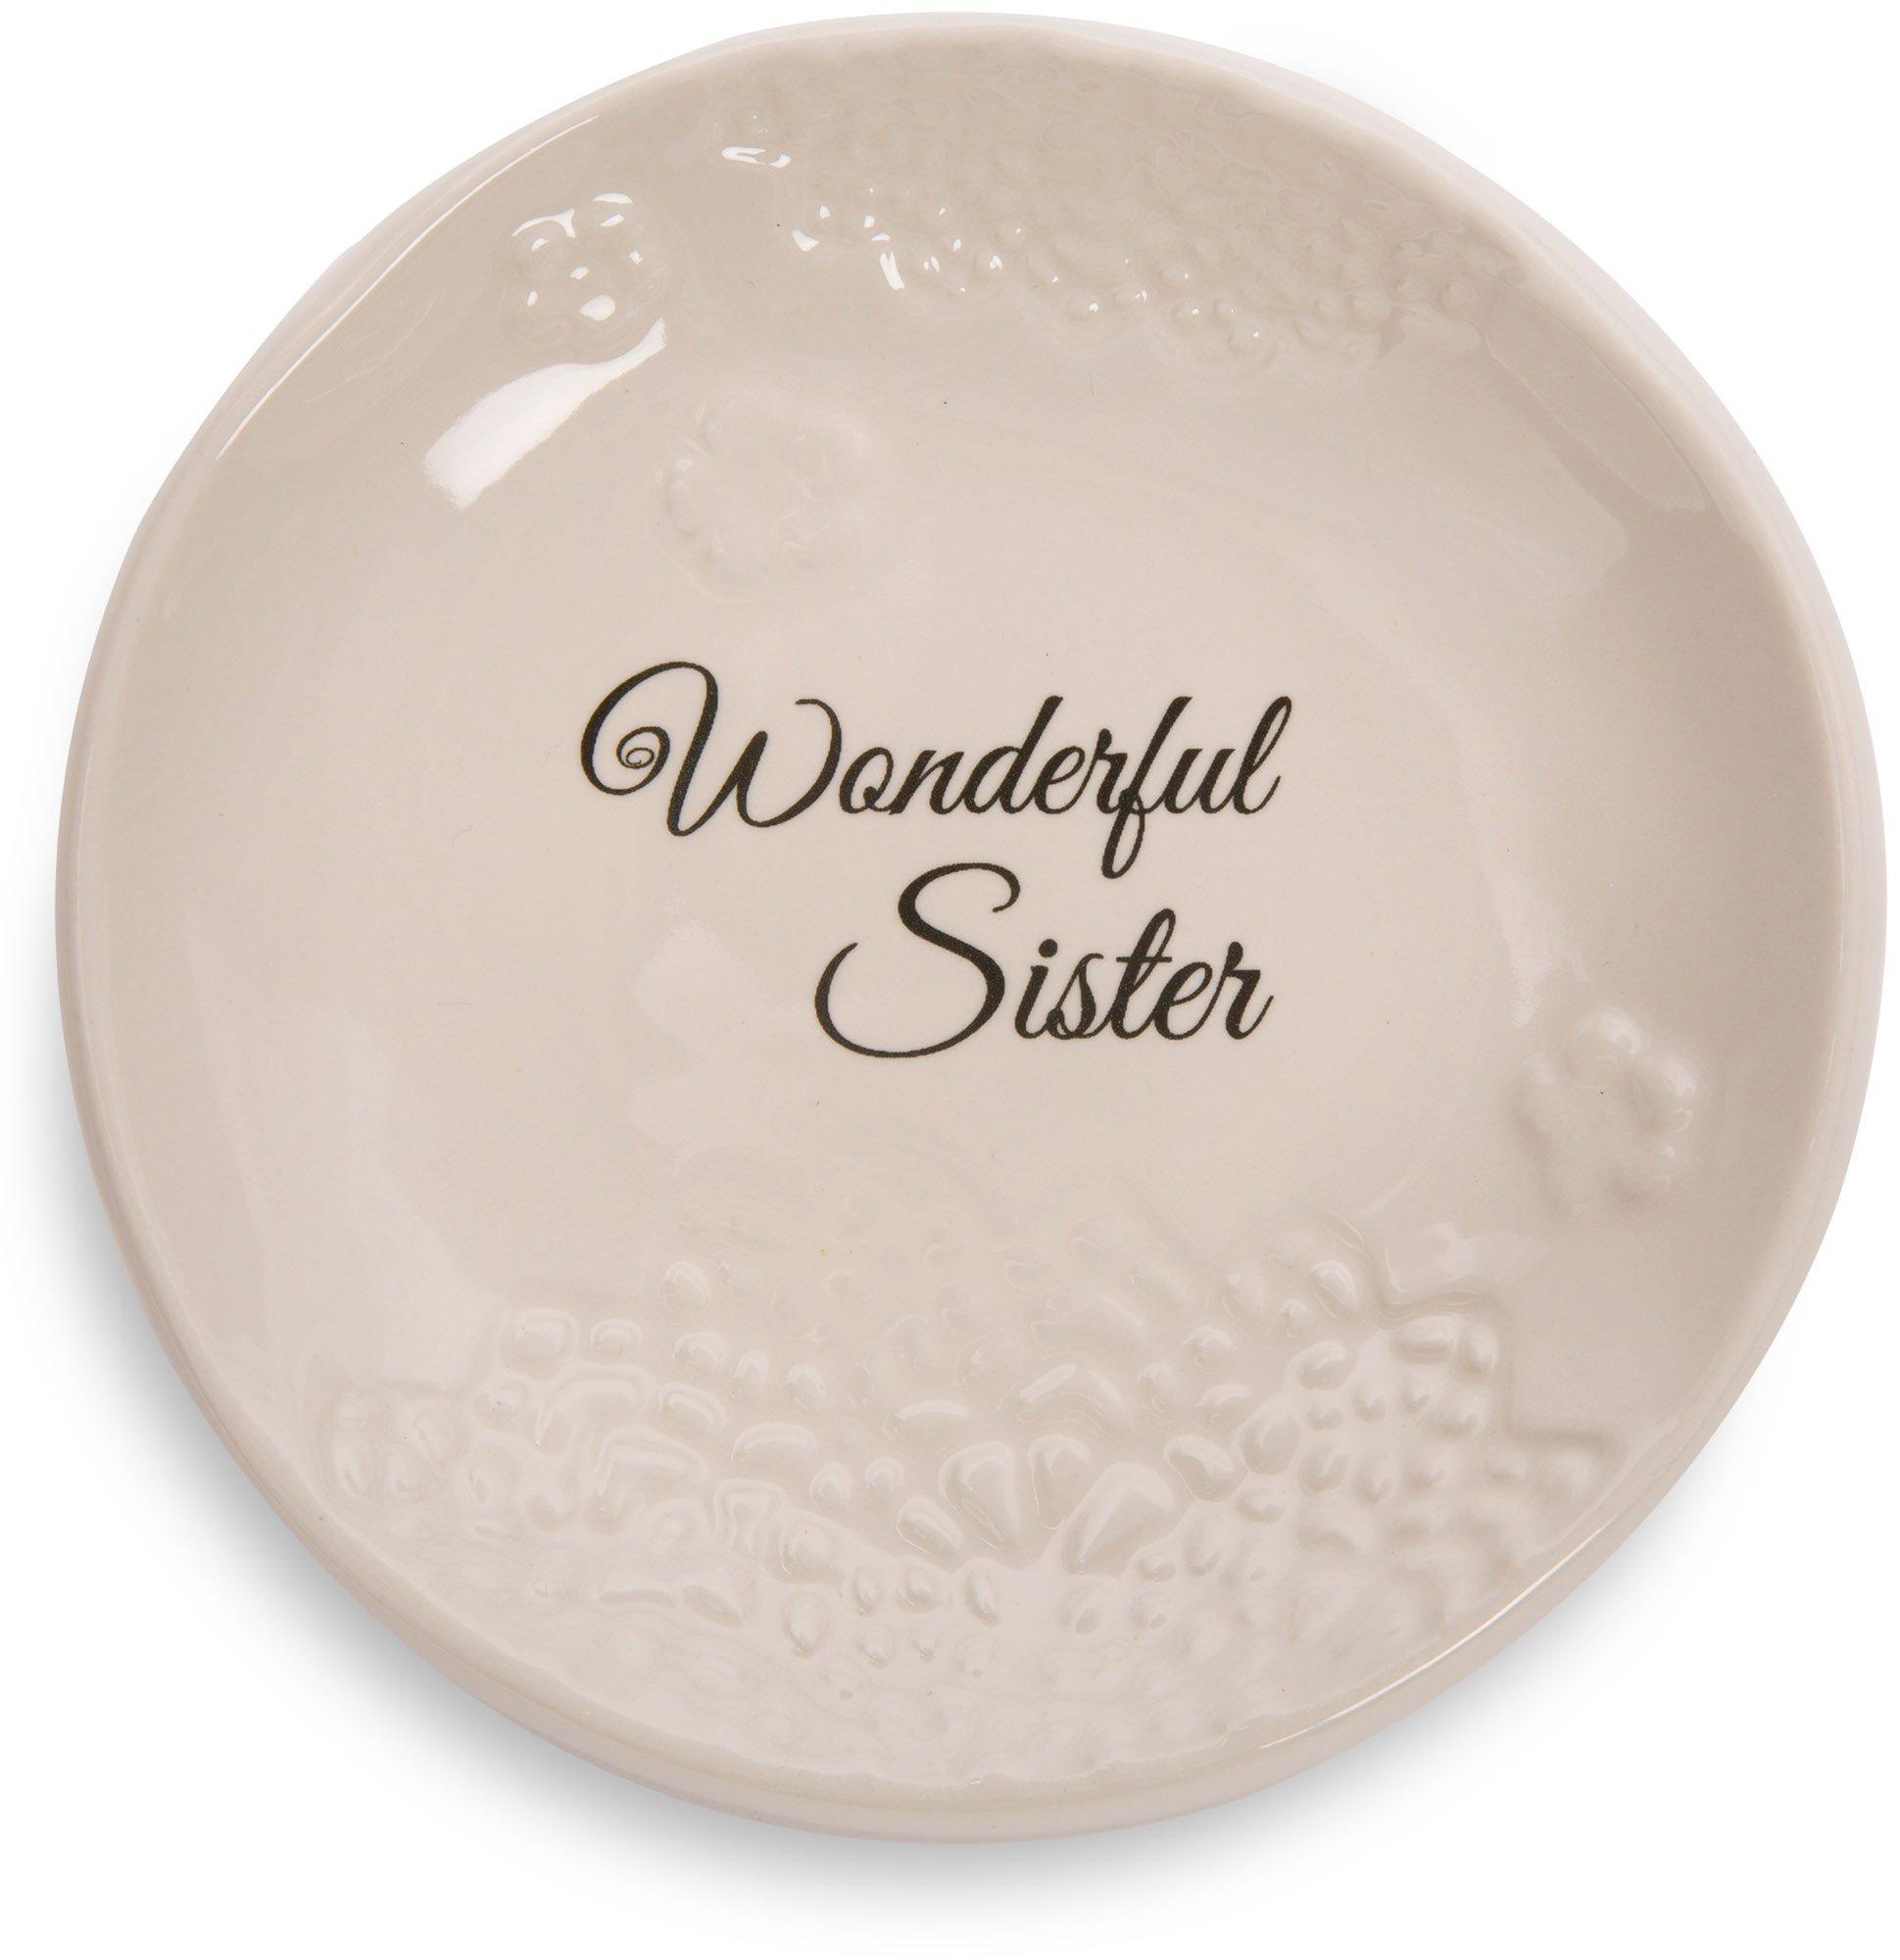 Pavilion Gift Company 19123 Light Your Way Everyday Wonderful Sister Decorative Ceramic Plate, 5''